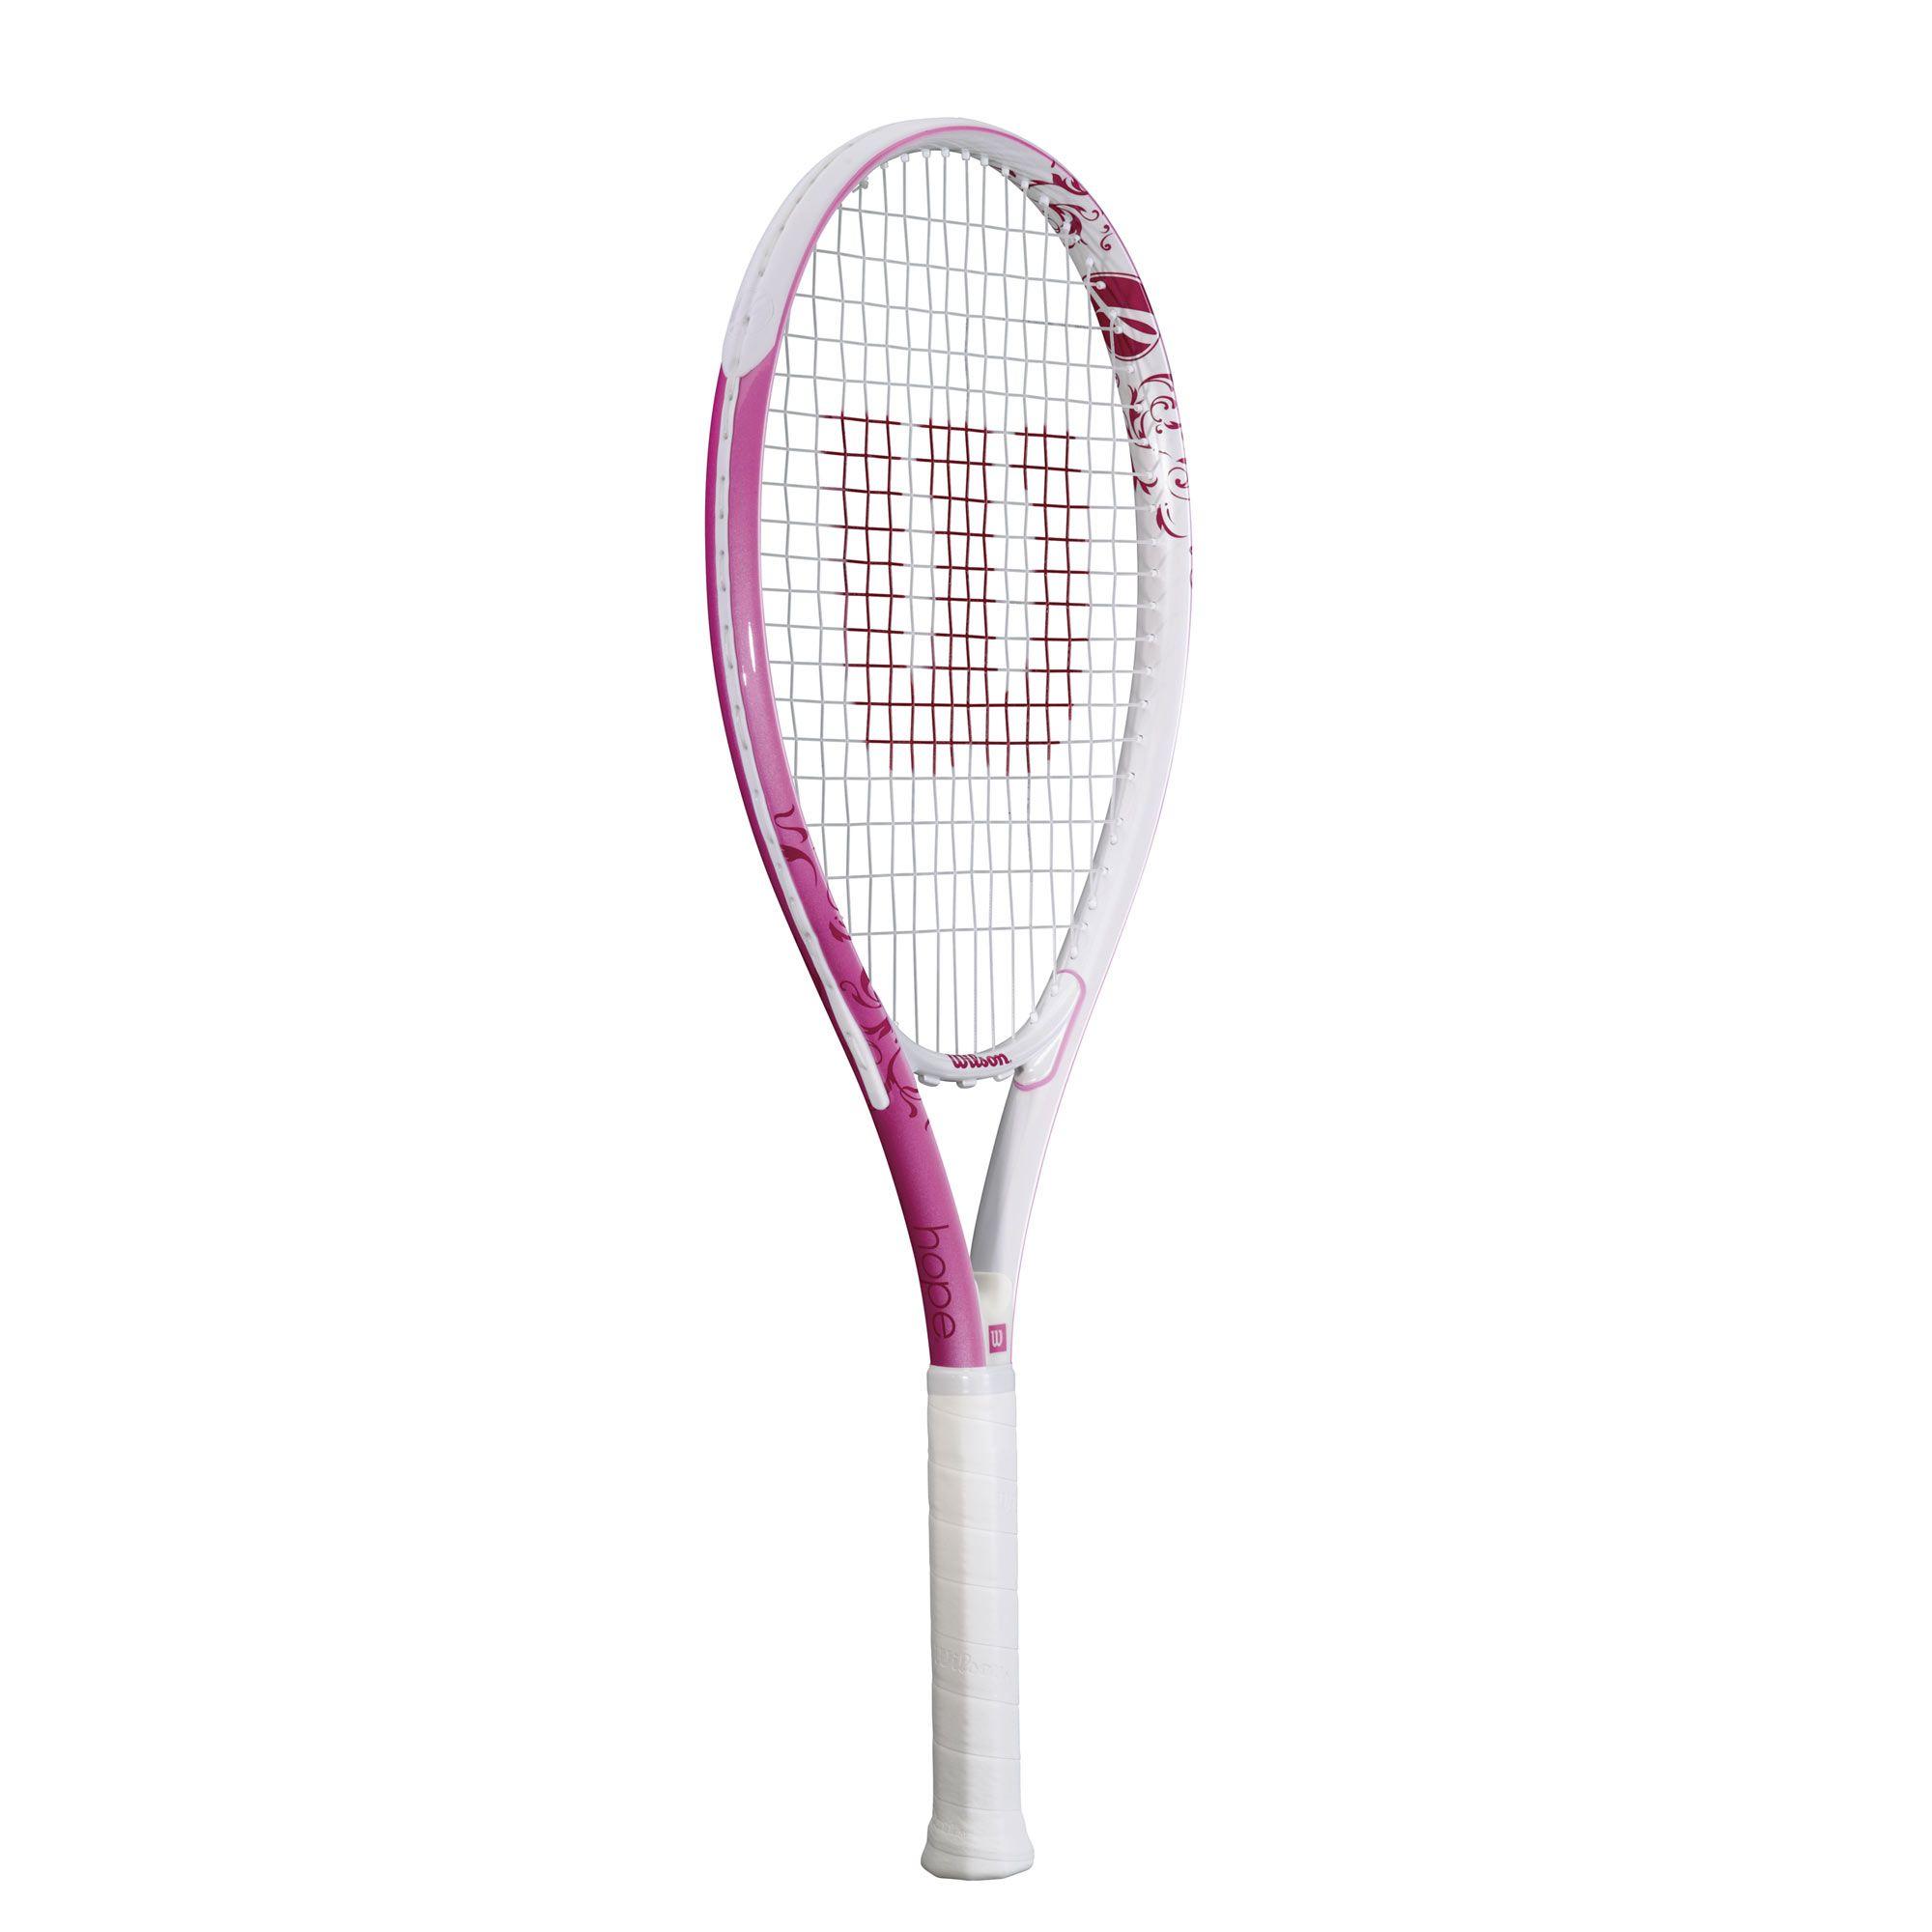 Wilson Hope Tennis Racket Ss14 Sweatband Com